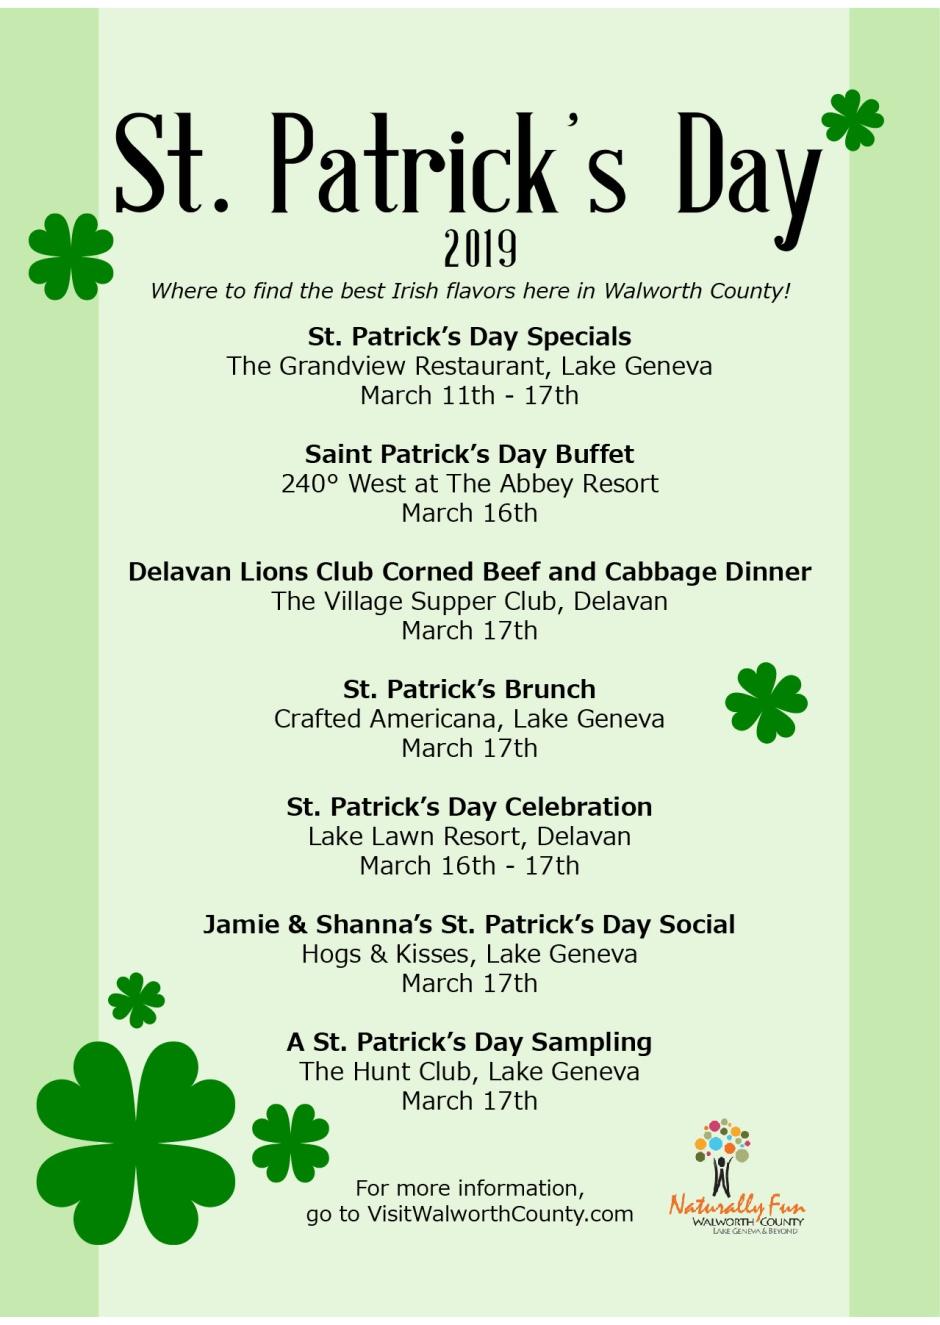 7dade0fba Tag: St. Patrick's Day